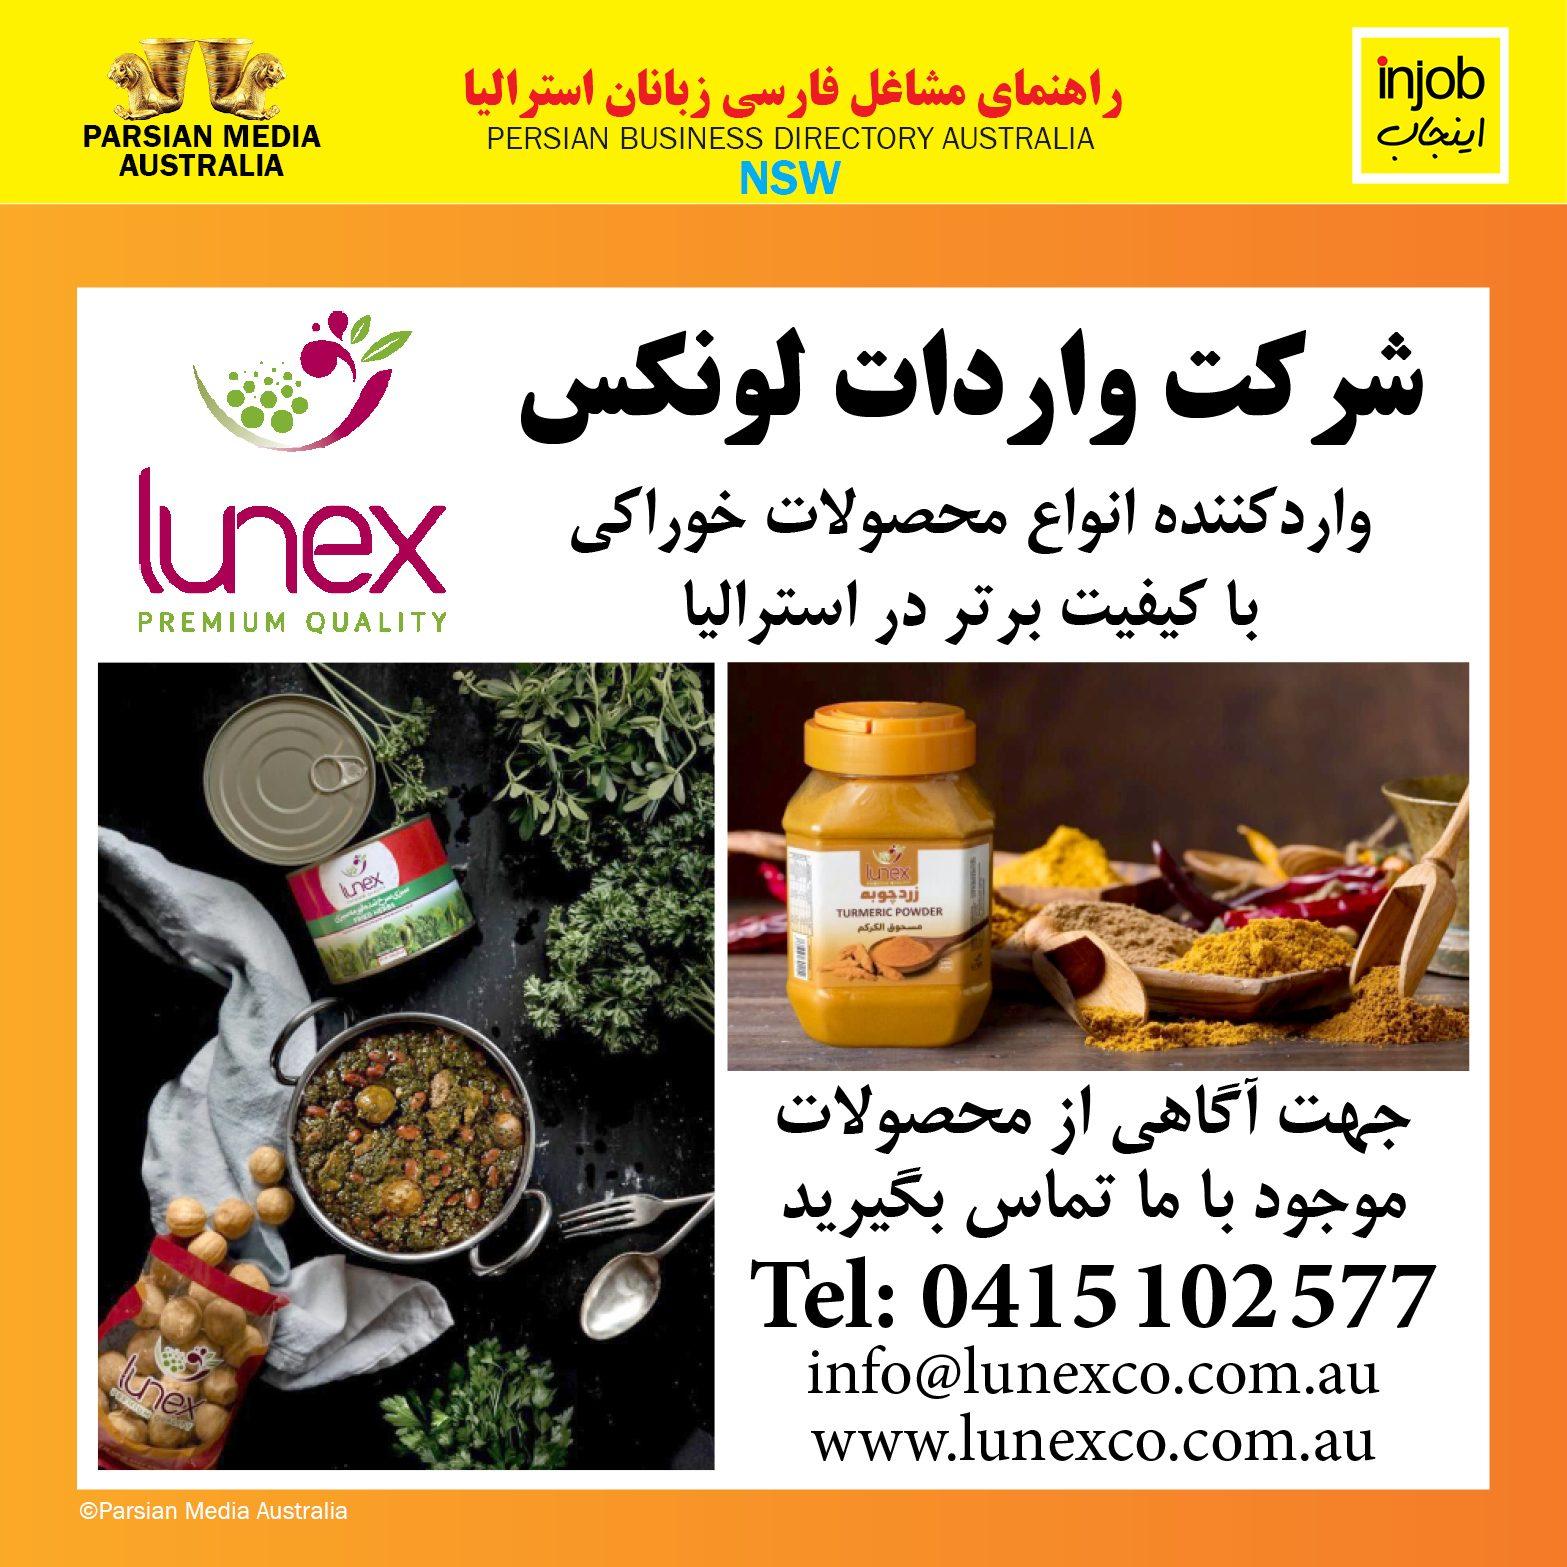 Lunex2-Injob-2022.jpg